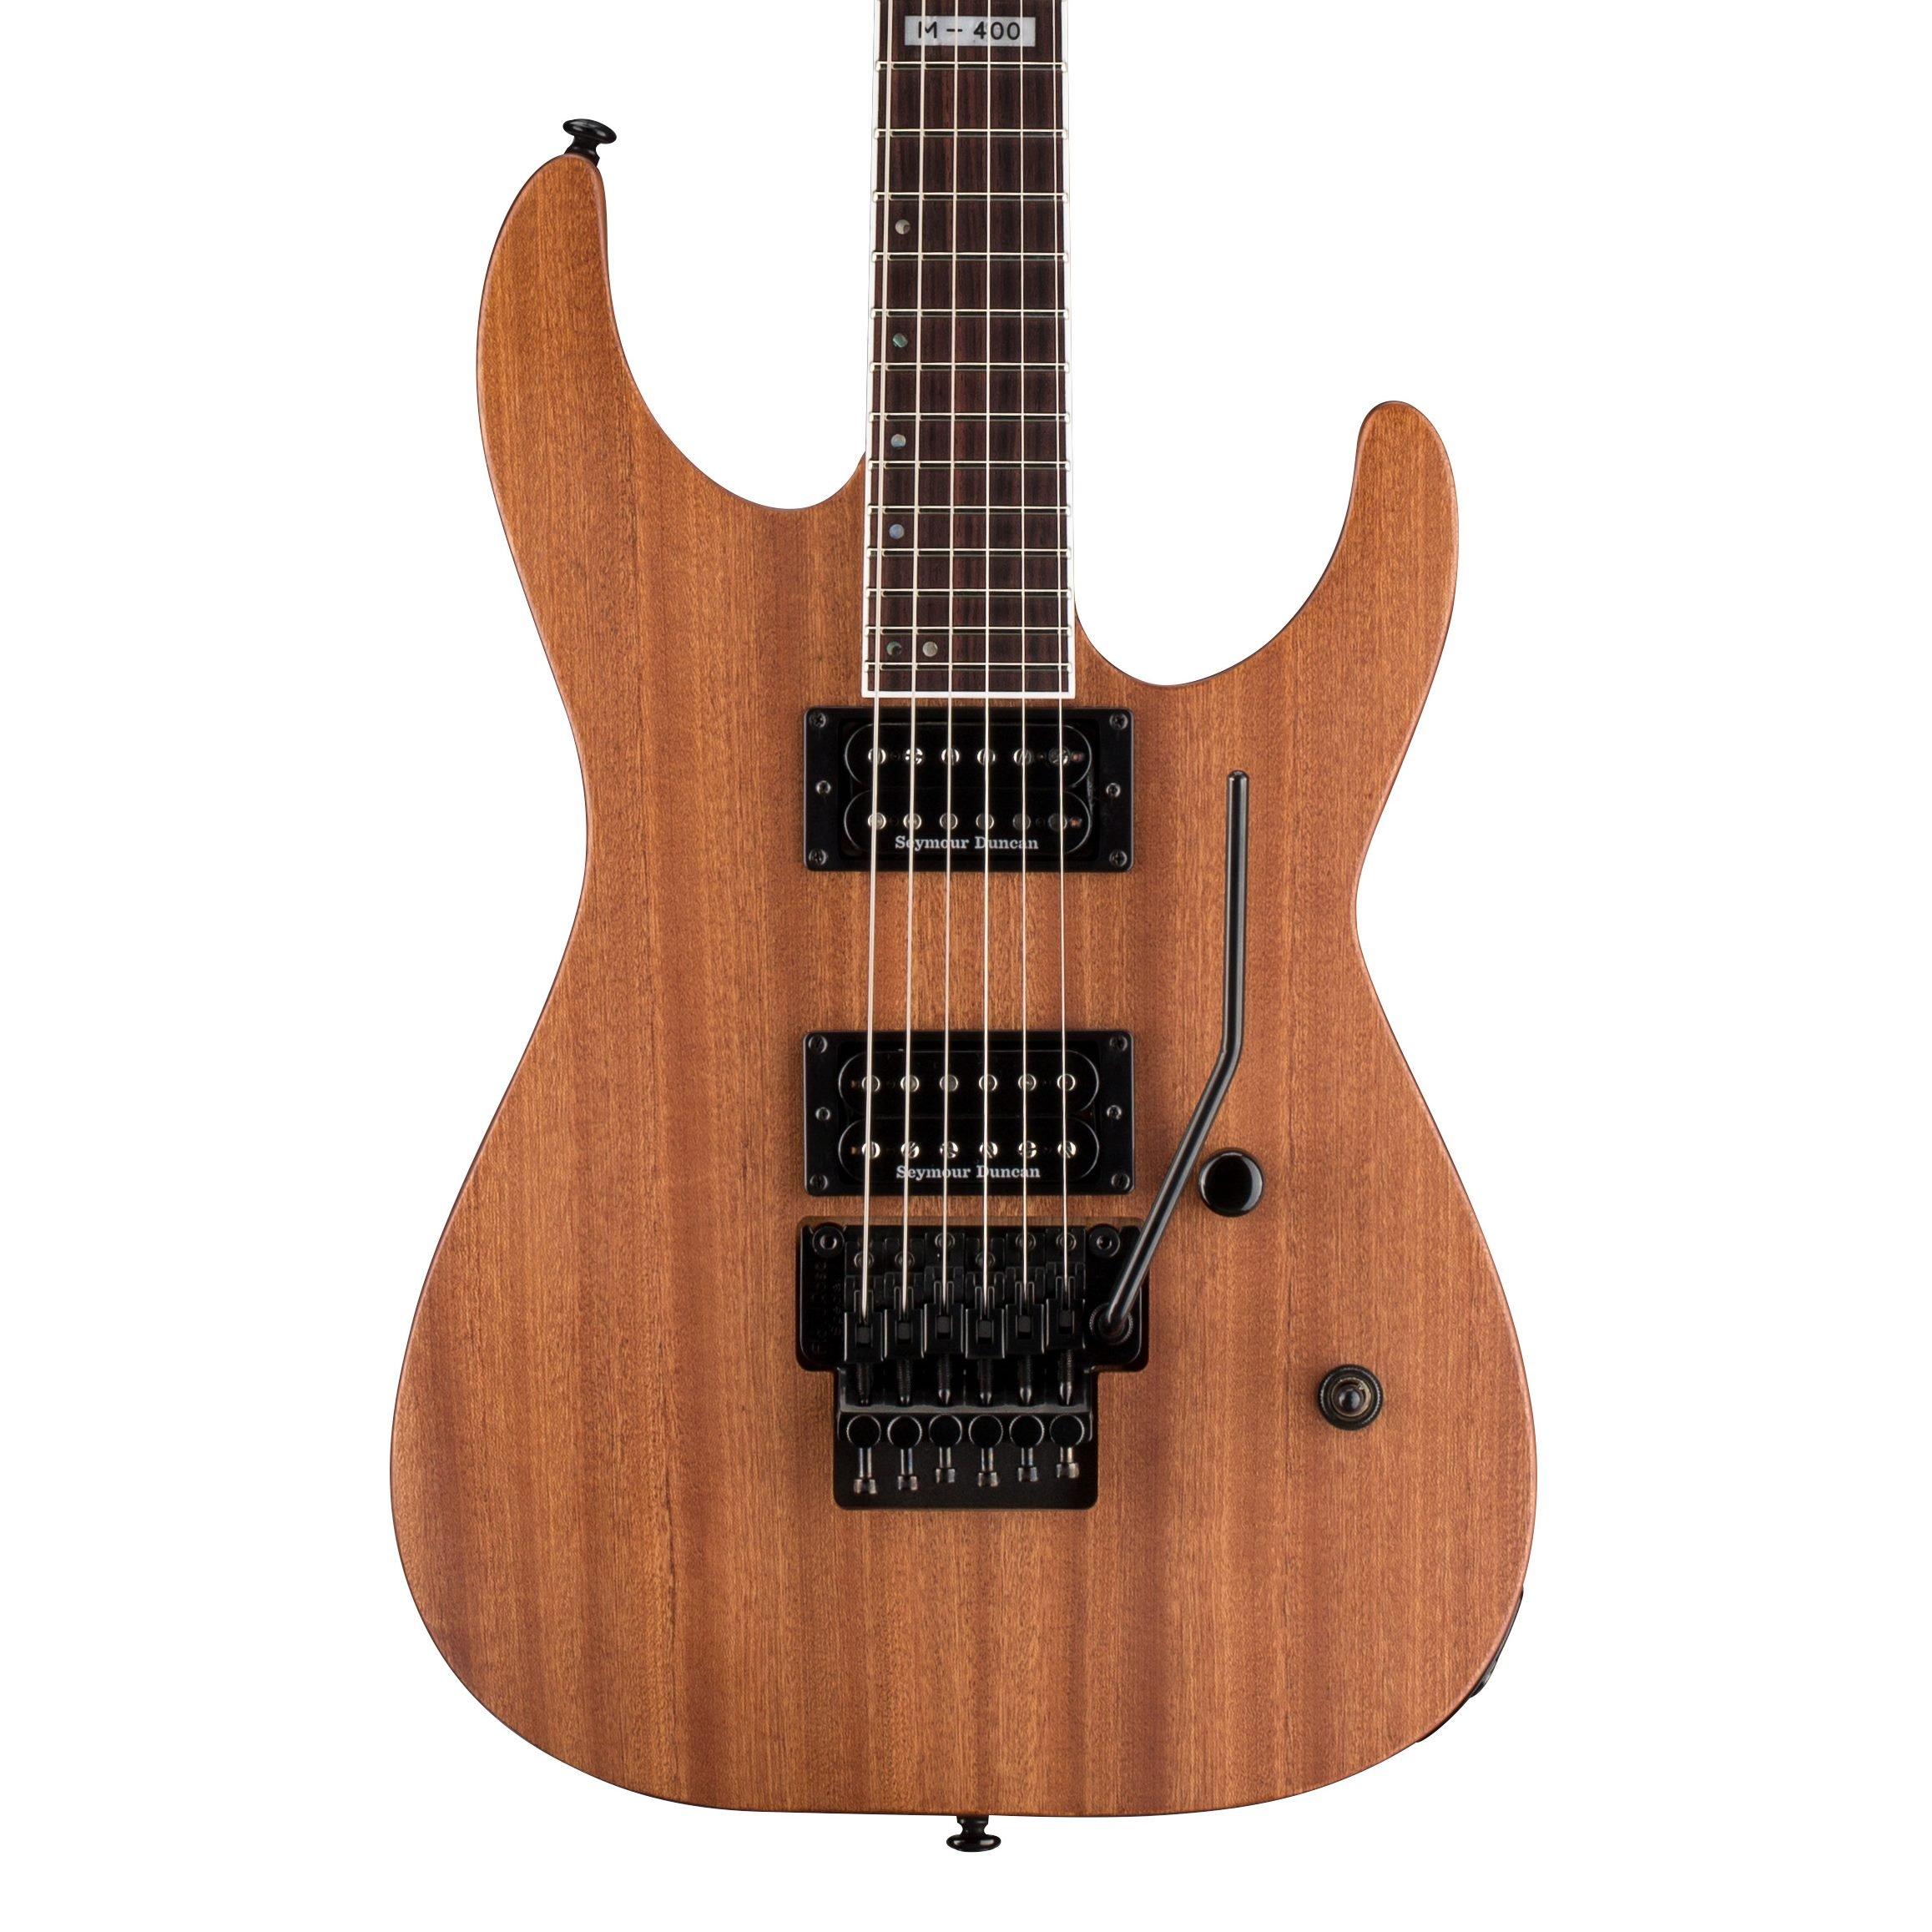 Cheap ESP LTD M-400M Electric Guitar Natural Satin Black Friday & Cyber Monday 2019